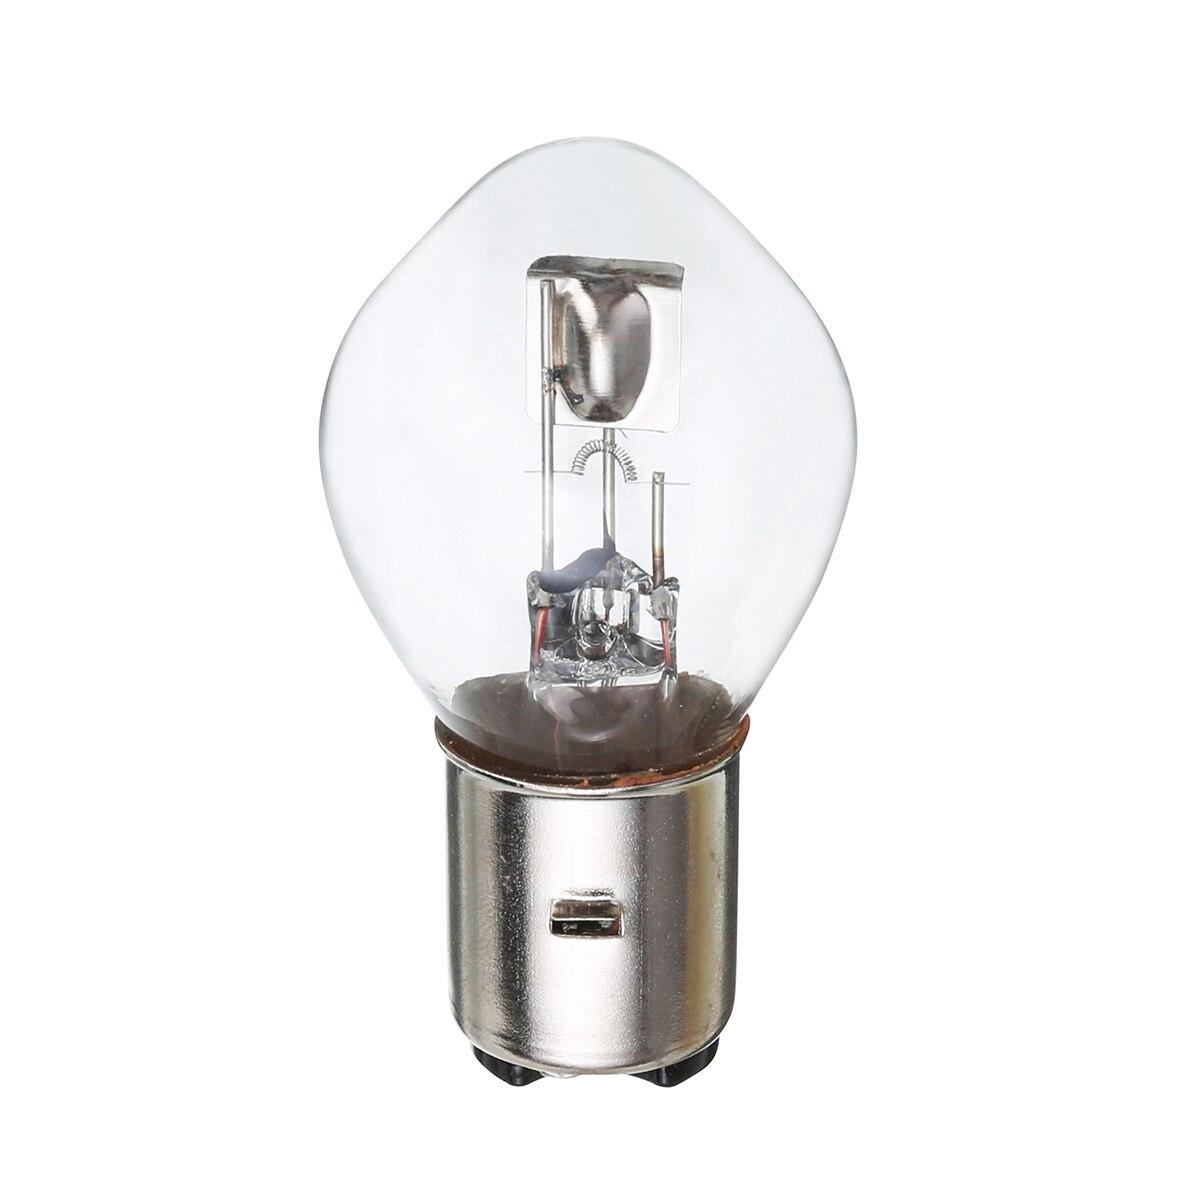 1 шт. 12В 35 Вт 10А B35 BA20D мотоциклетные батареи фары белый головной свет лампы супер яркая лампа для Скутер мопед вездеход